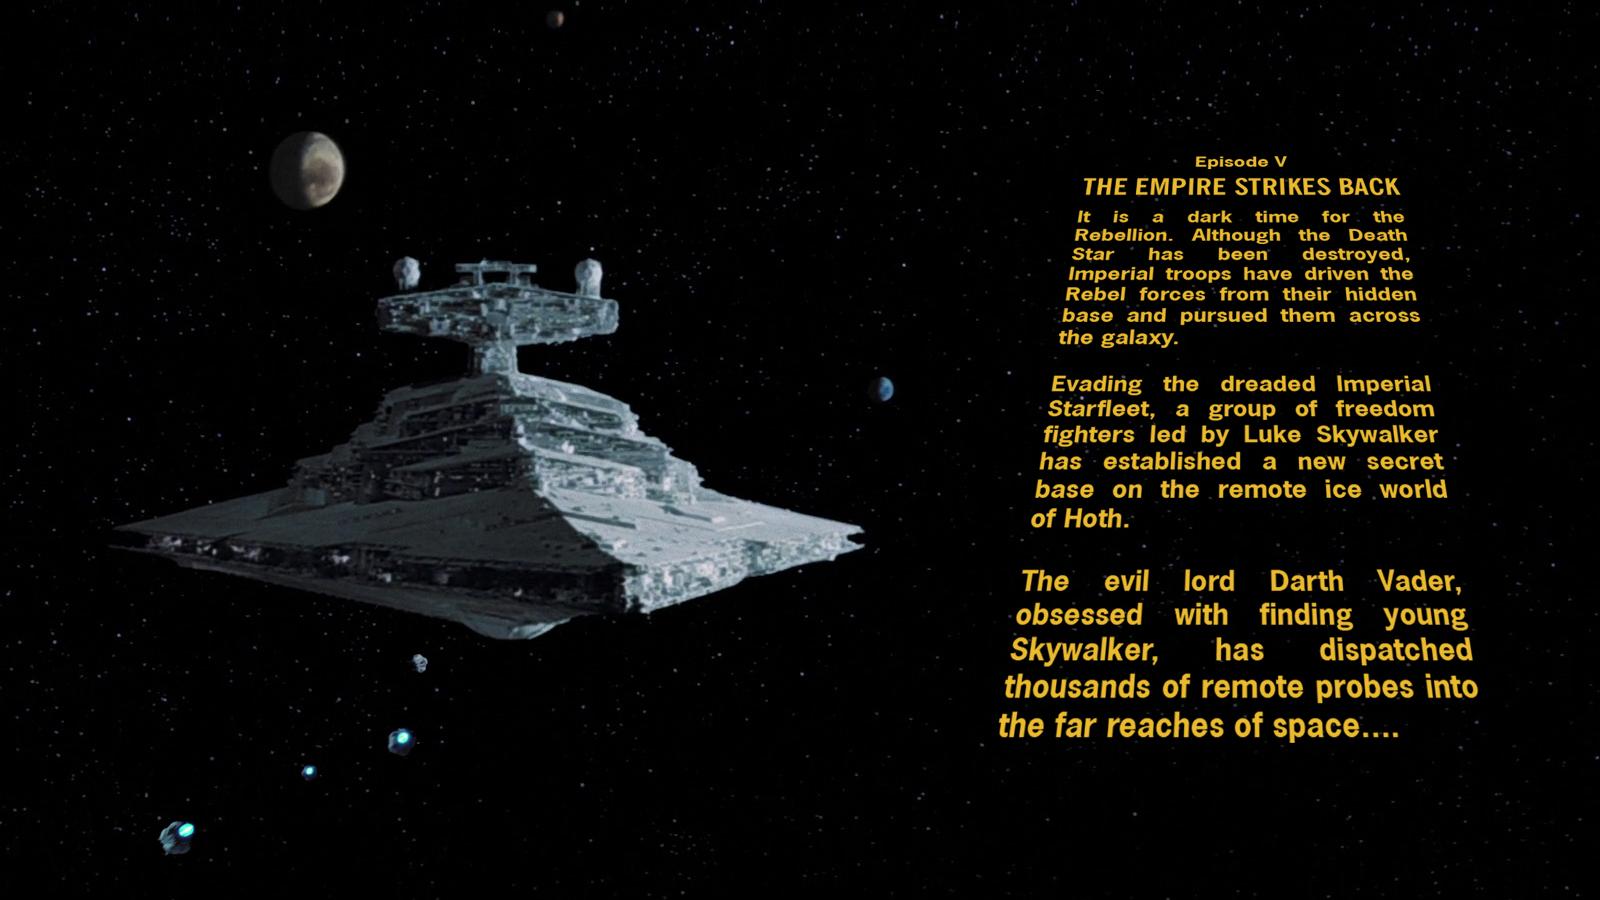 Star Wars Episode V Crawl Wallpaper By Spirit Of Adventure On Deviantart